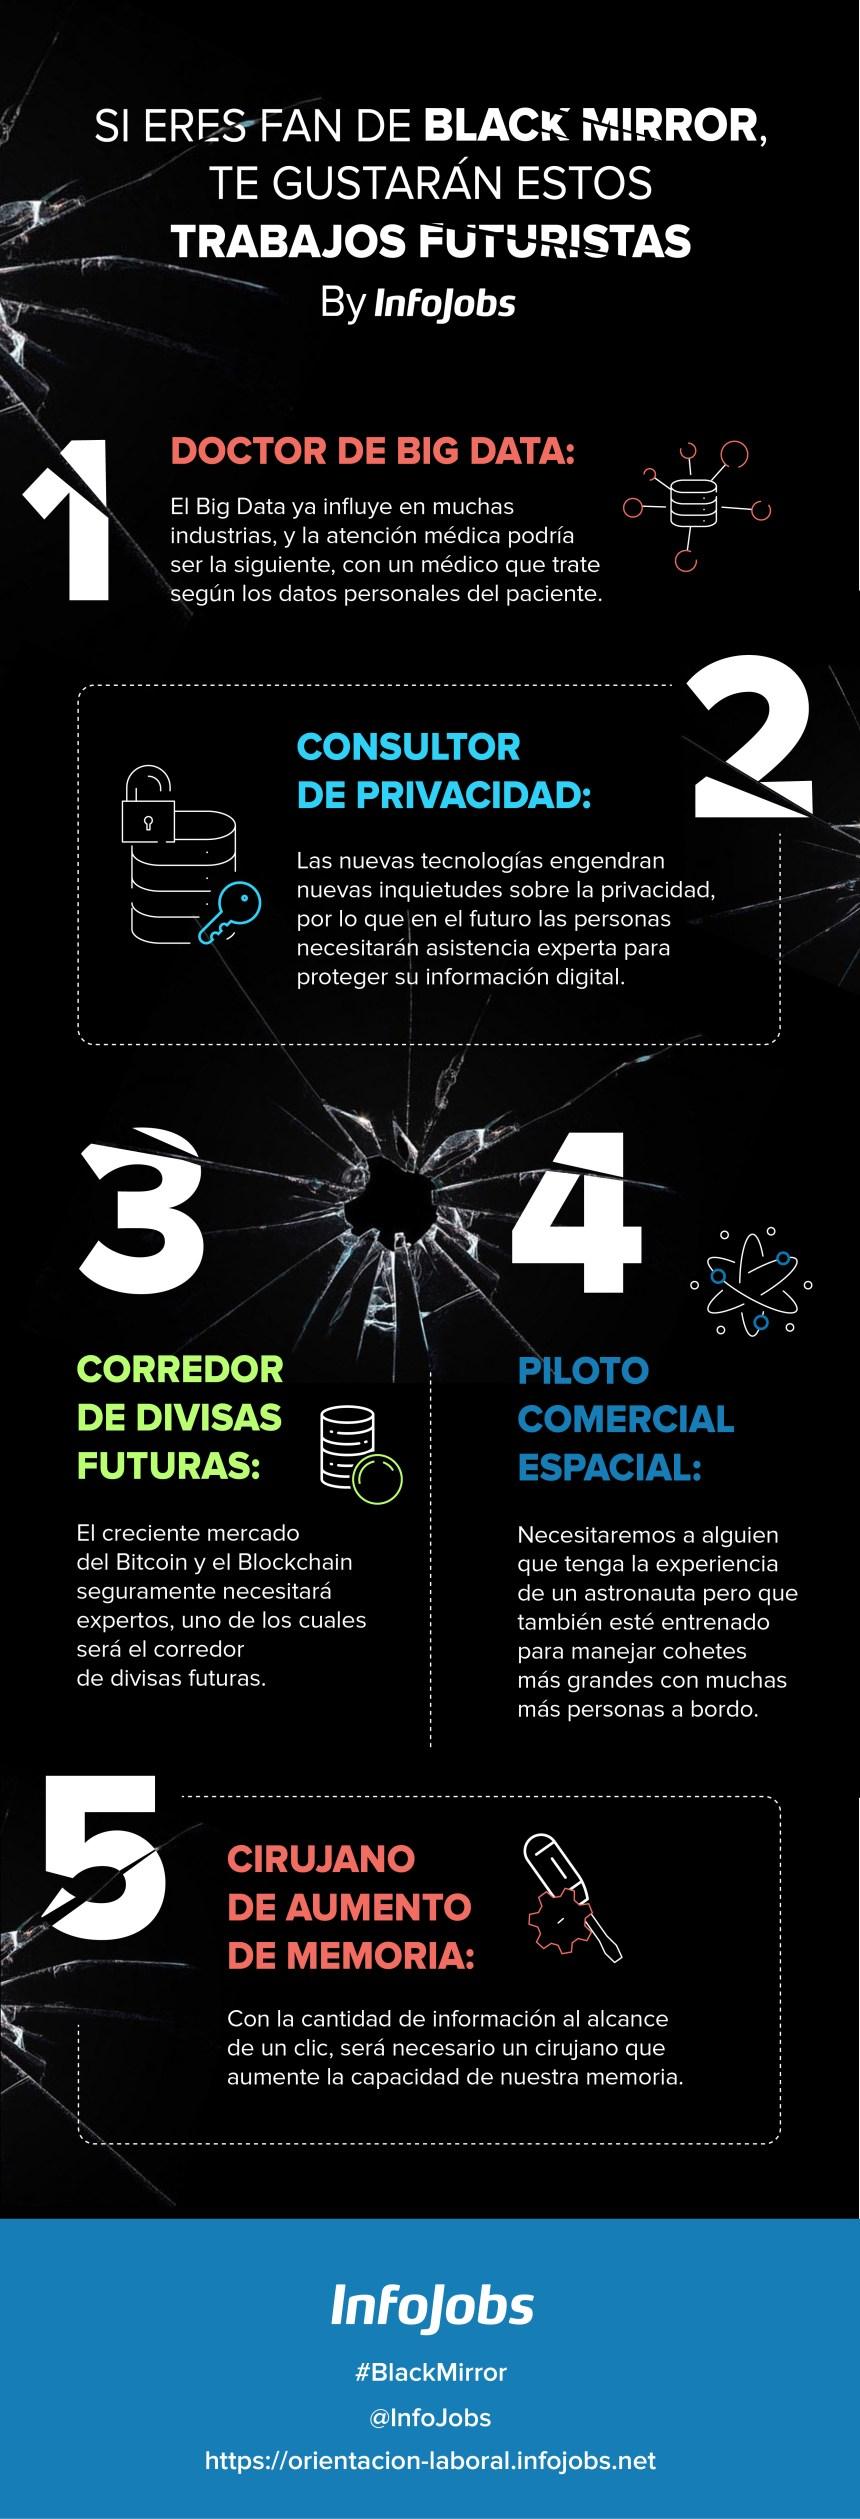 Trabajos futuristas (para fans de Black Mirror) #infografia #infographic #empleo